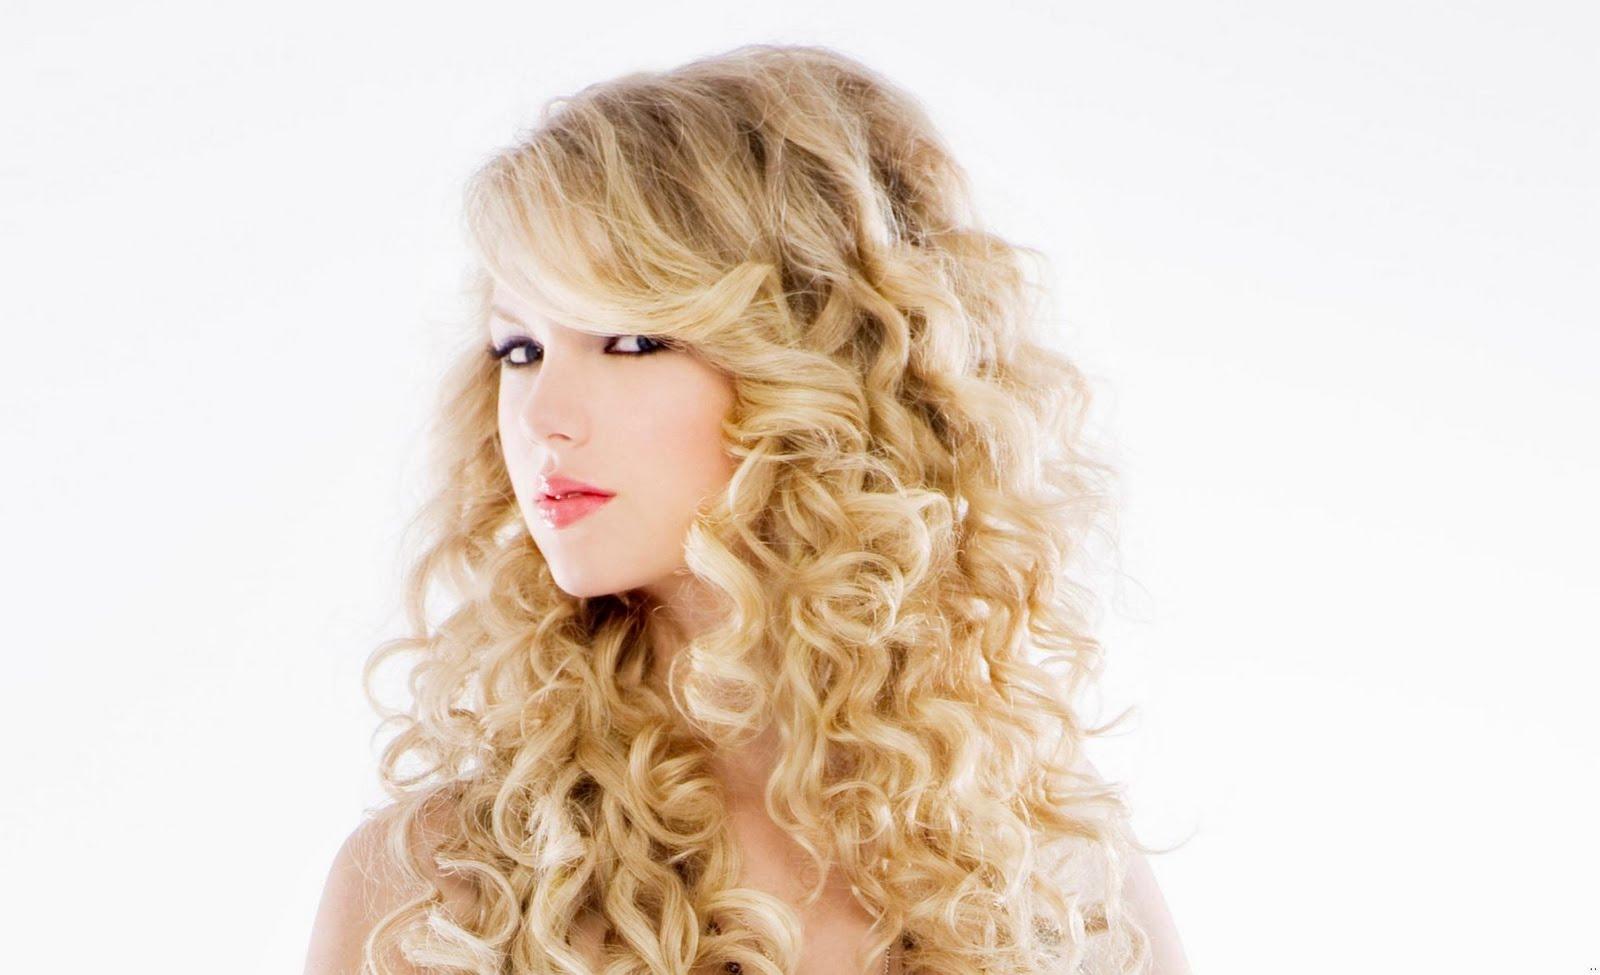 Hollywood Beautiful Girl Hd Wallpaper Taylor Swift Valentine Girl Wallpapers Taste Wallpapers